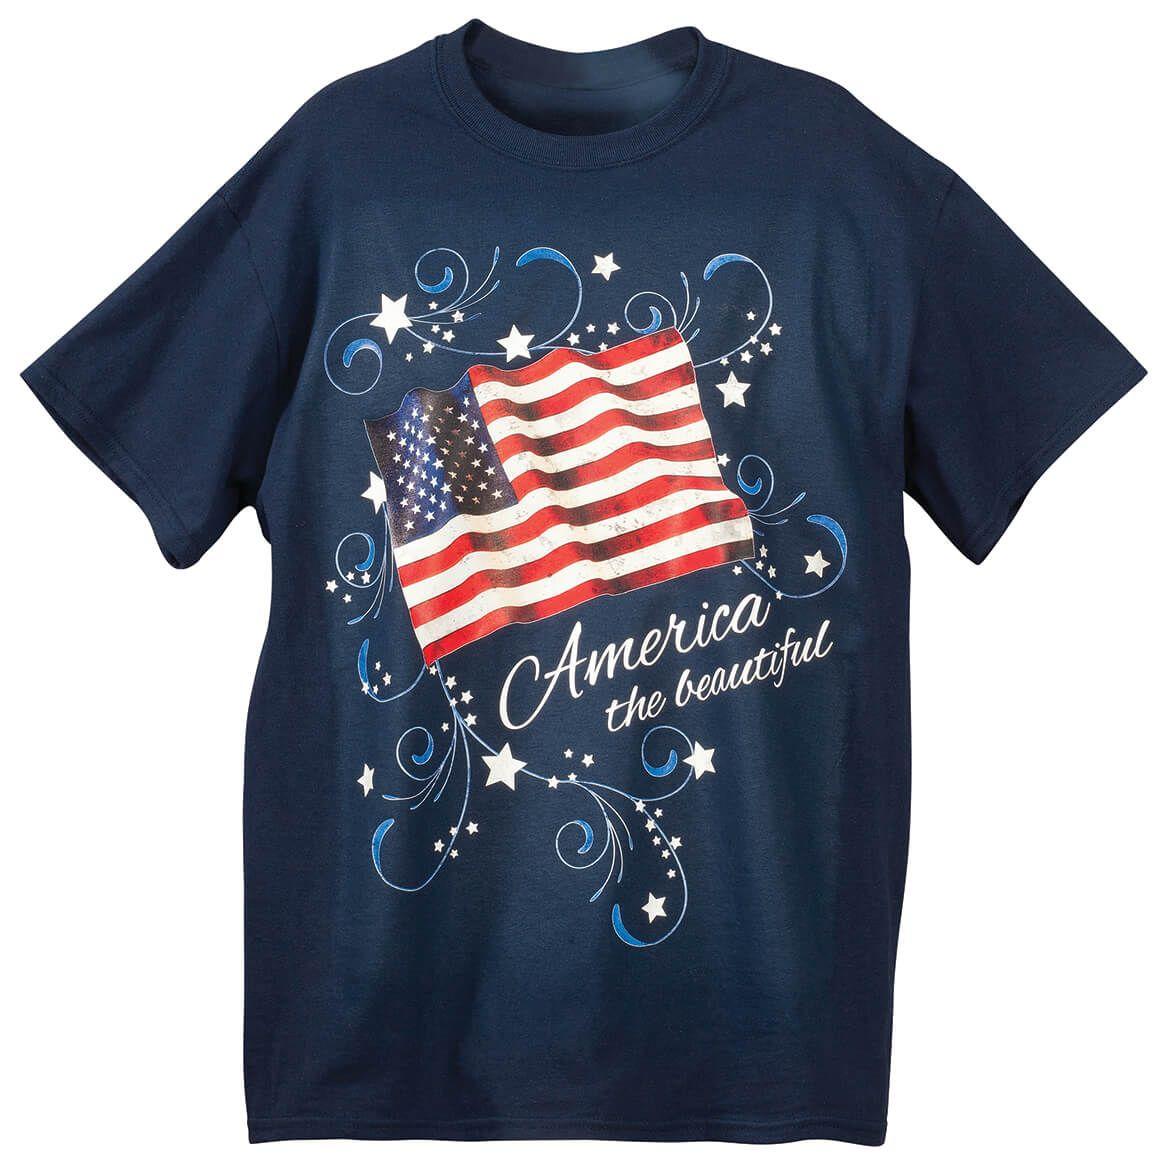 Stars and Stripes T-Shirt-349148